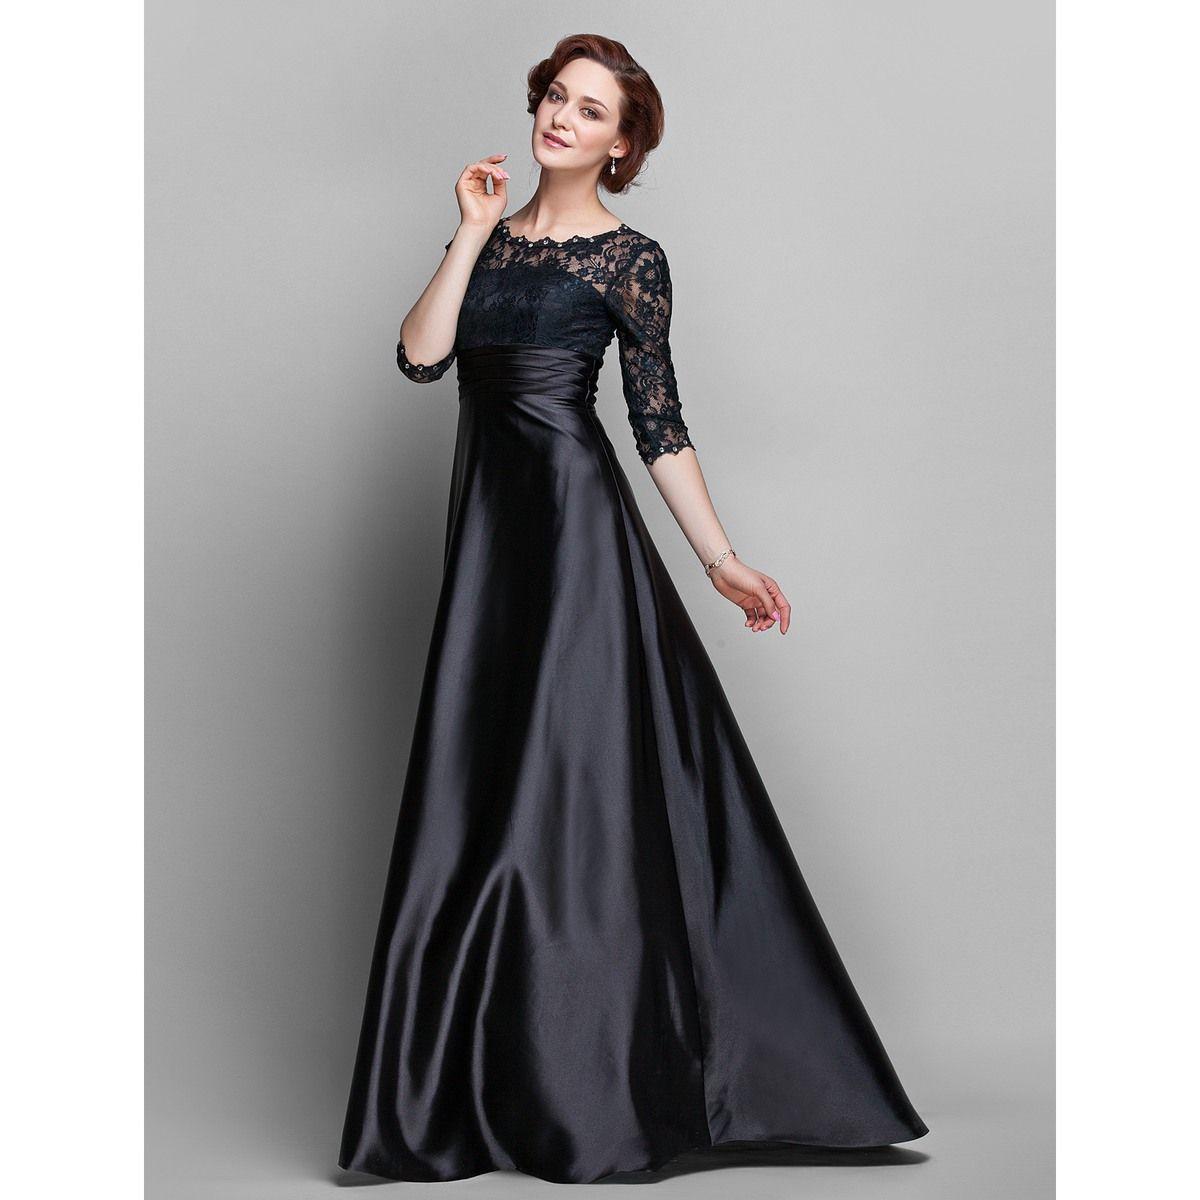 Gleam satin dress navy satin dresses satin mini dress and satin